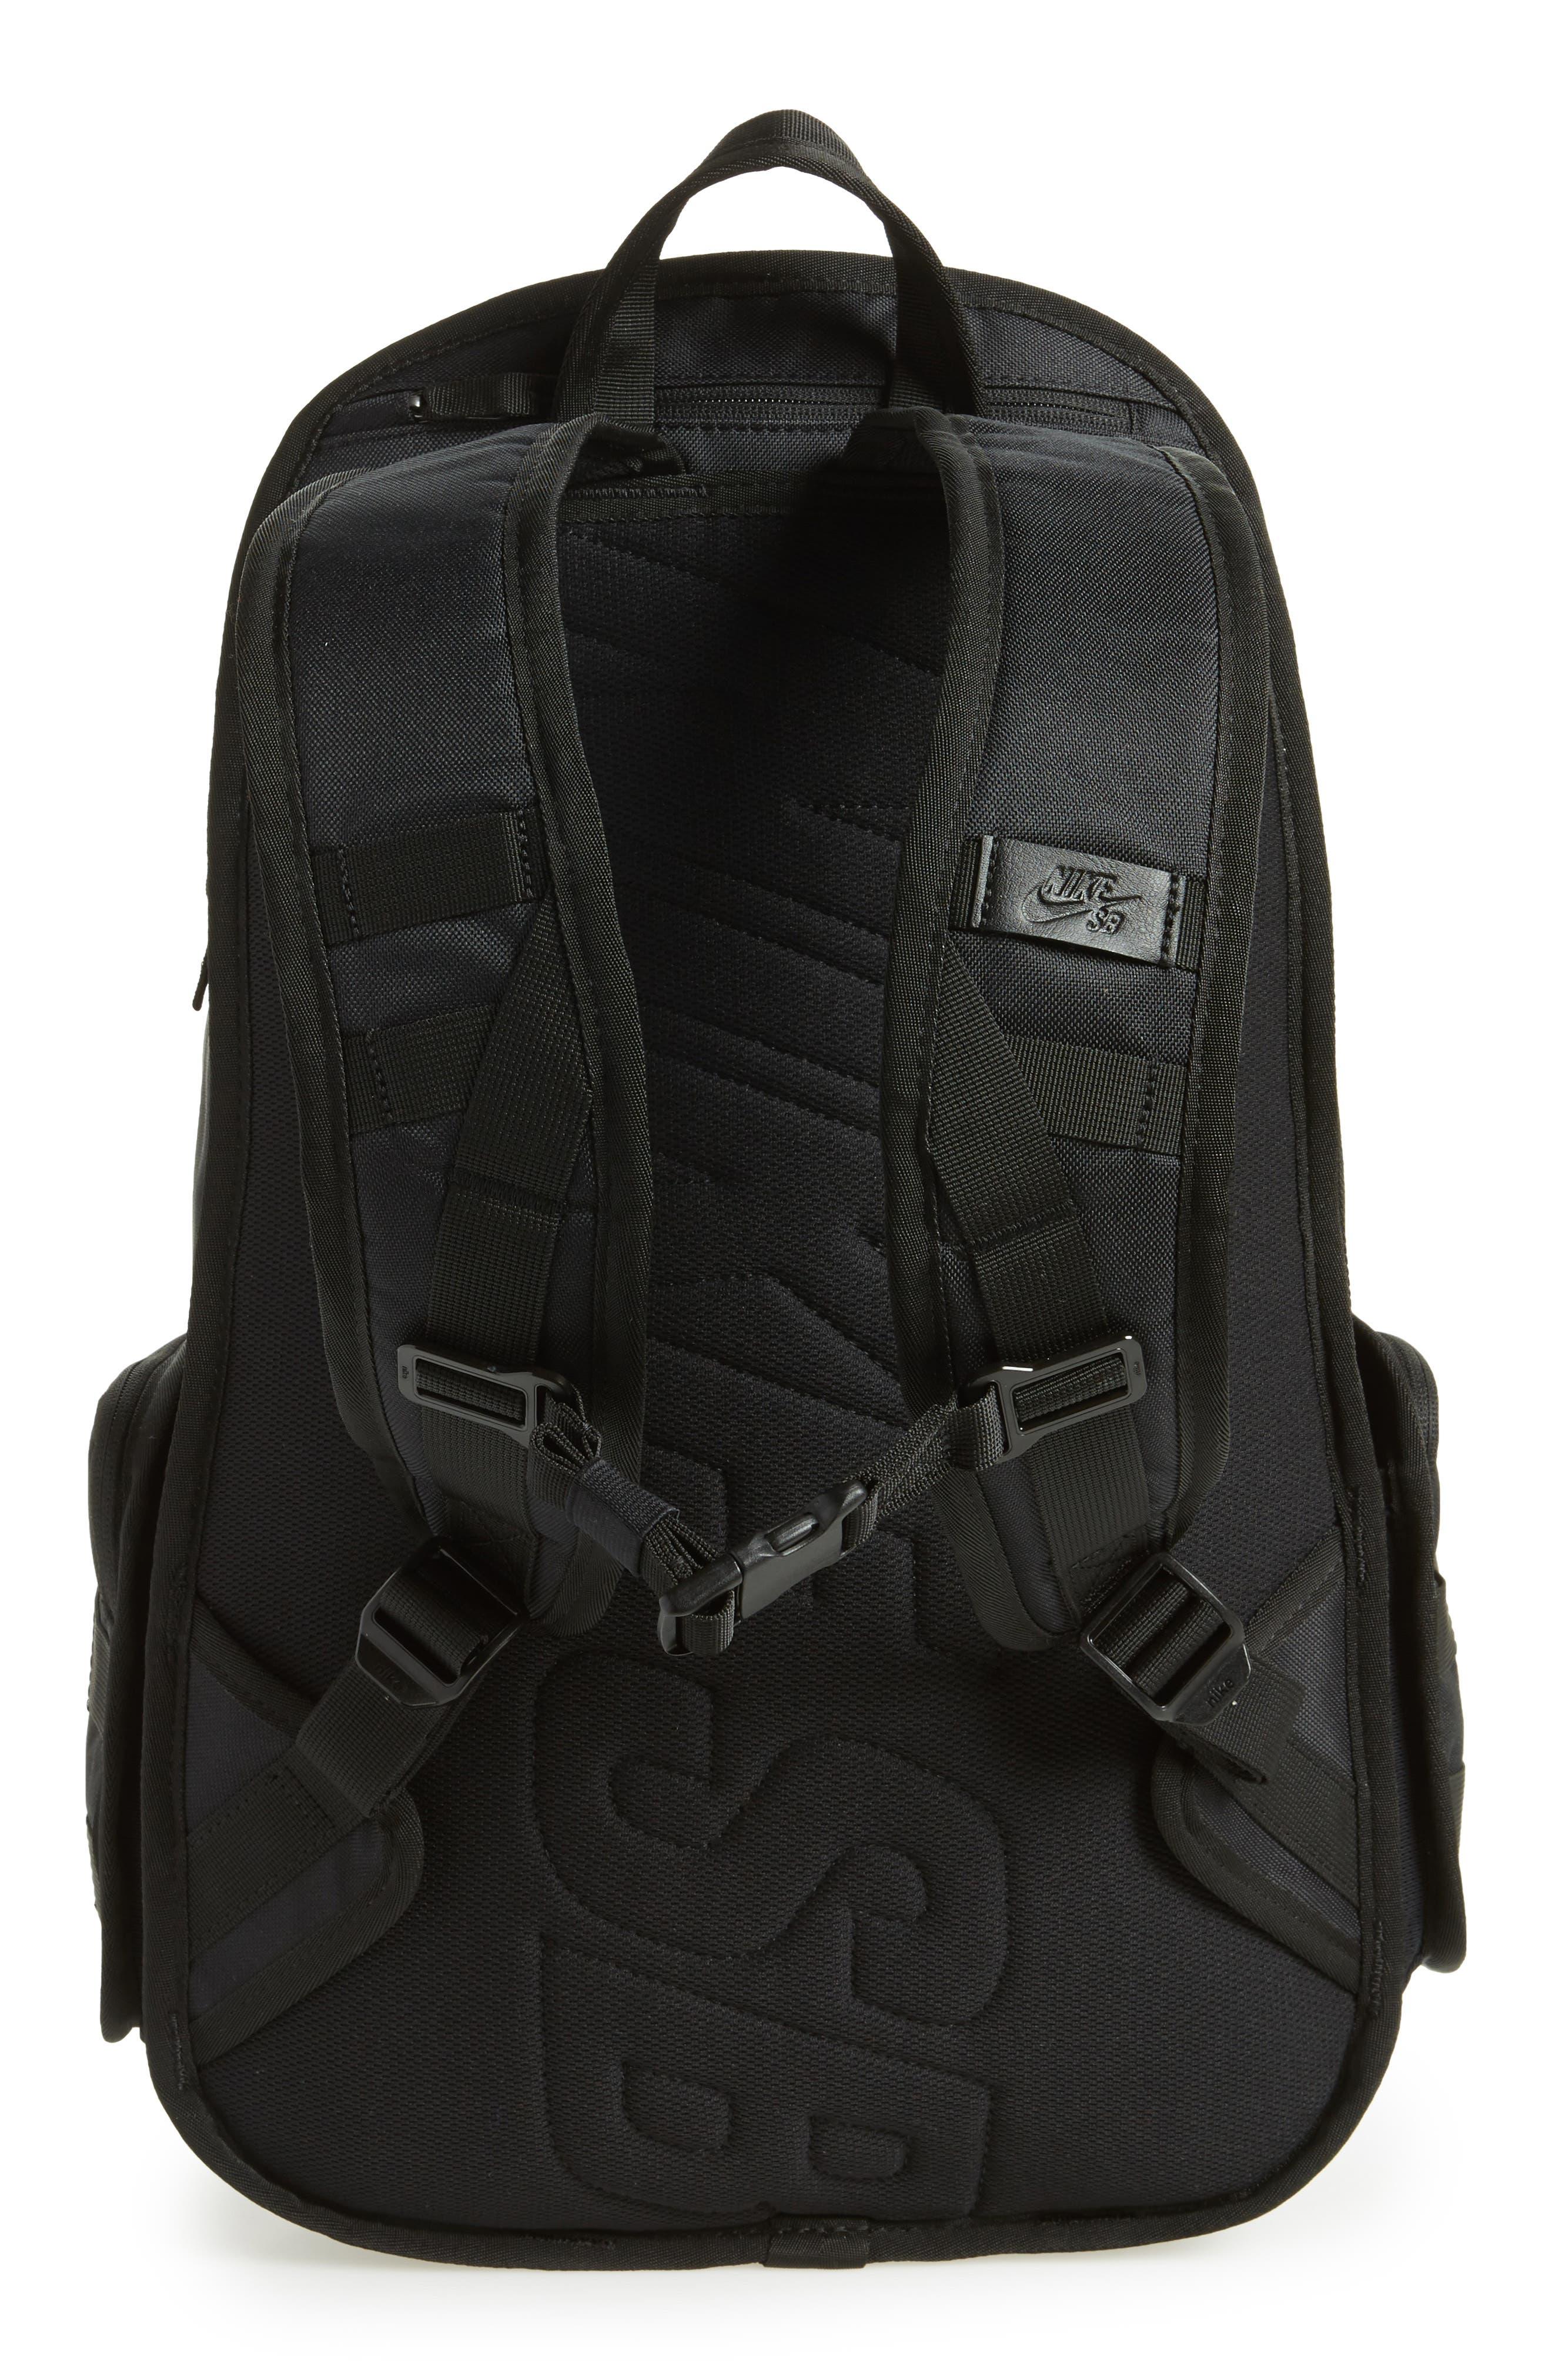 RPM Backpack,                             Alternate thumbnail 3, color,                             BLACK/ BLACK/ BLACK